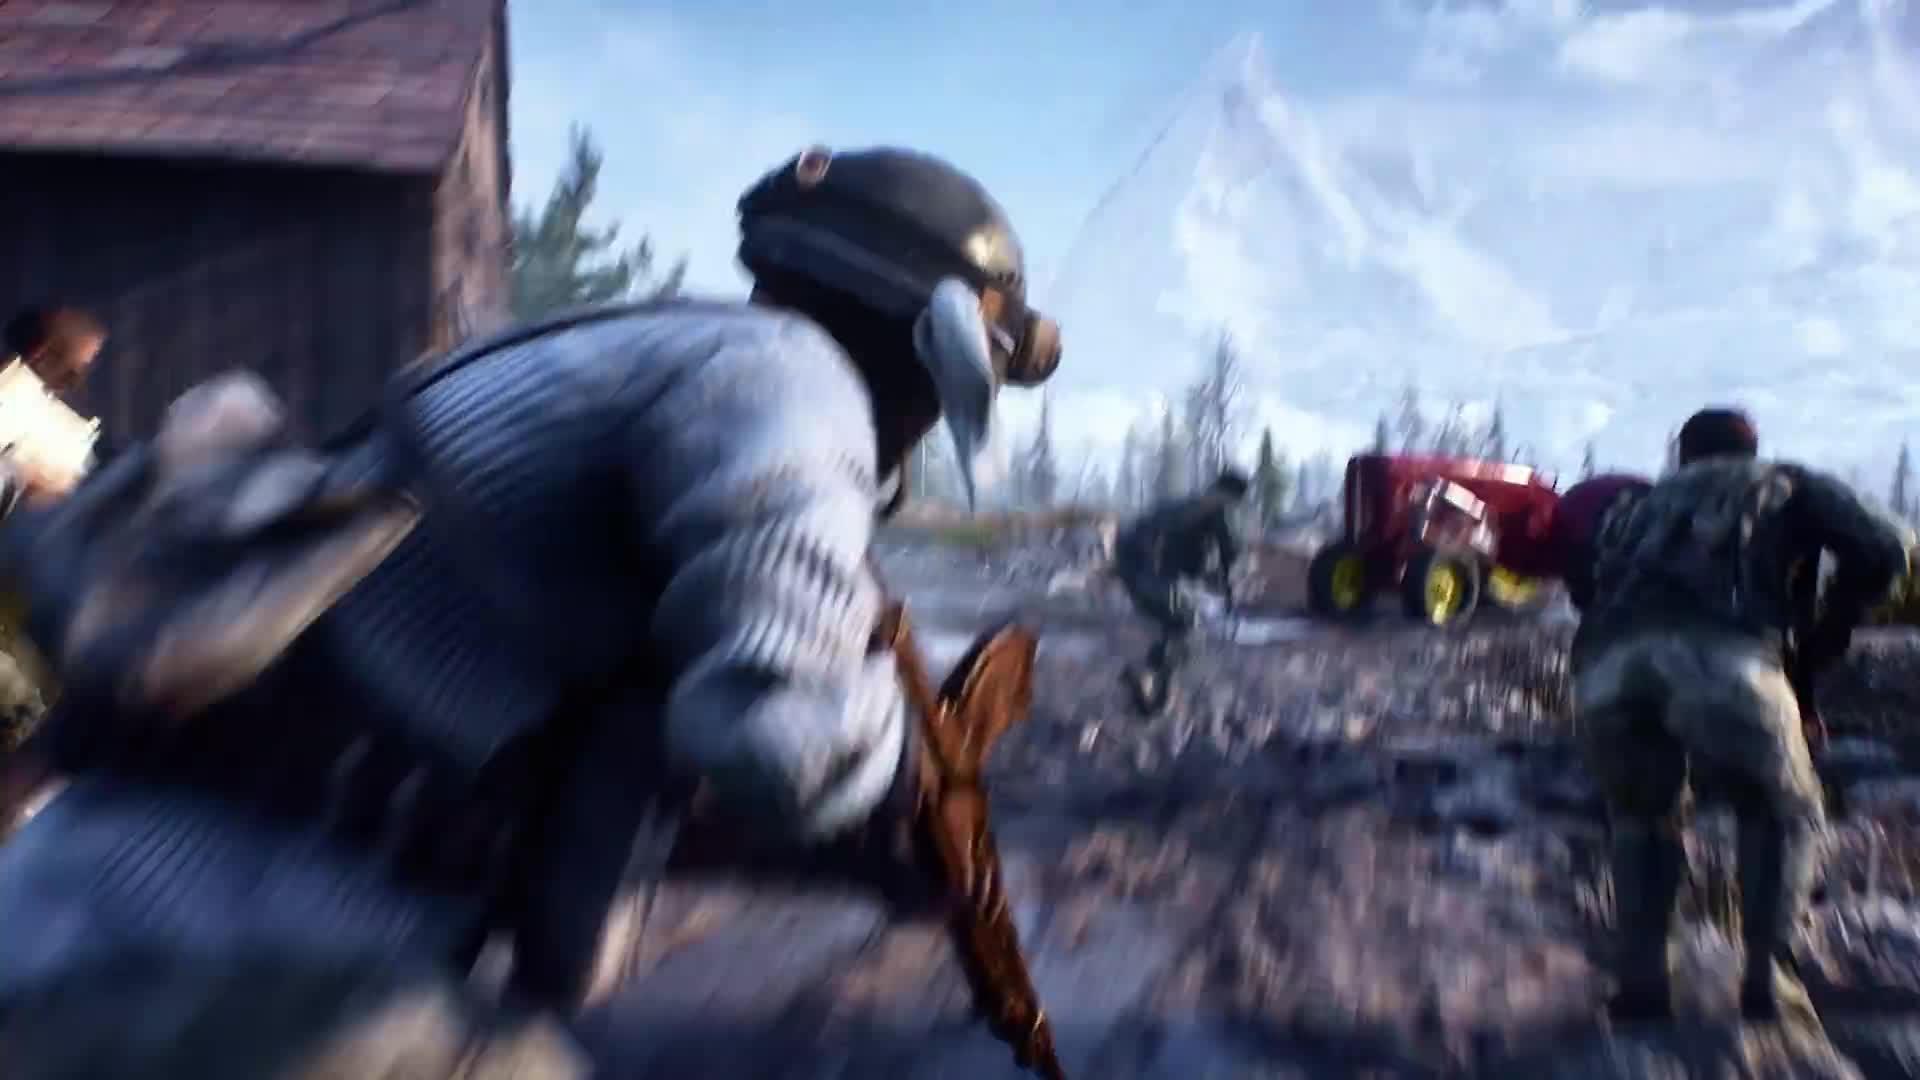 Trailer, Electronic Arts, Ego-Shooter, Ea, Battlefield, Dice, Battlefield 5, Battle Royale, Battlefield V, Feuersturm, Firestorm